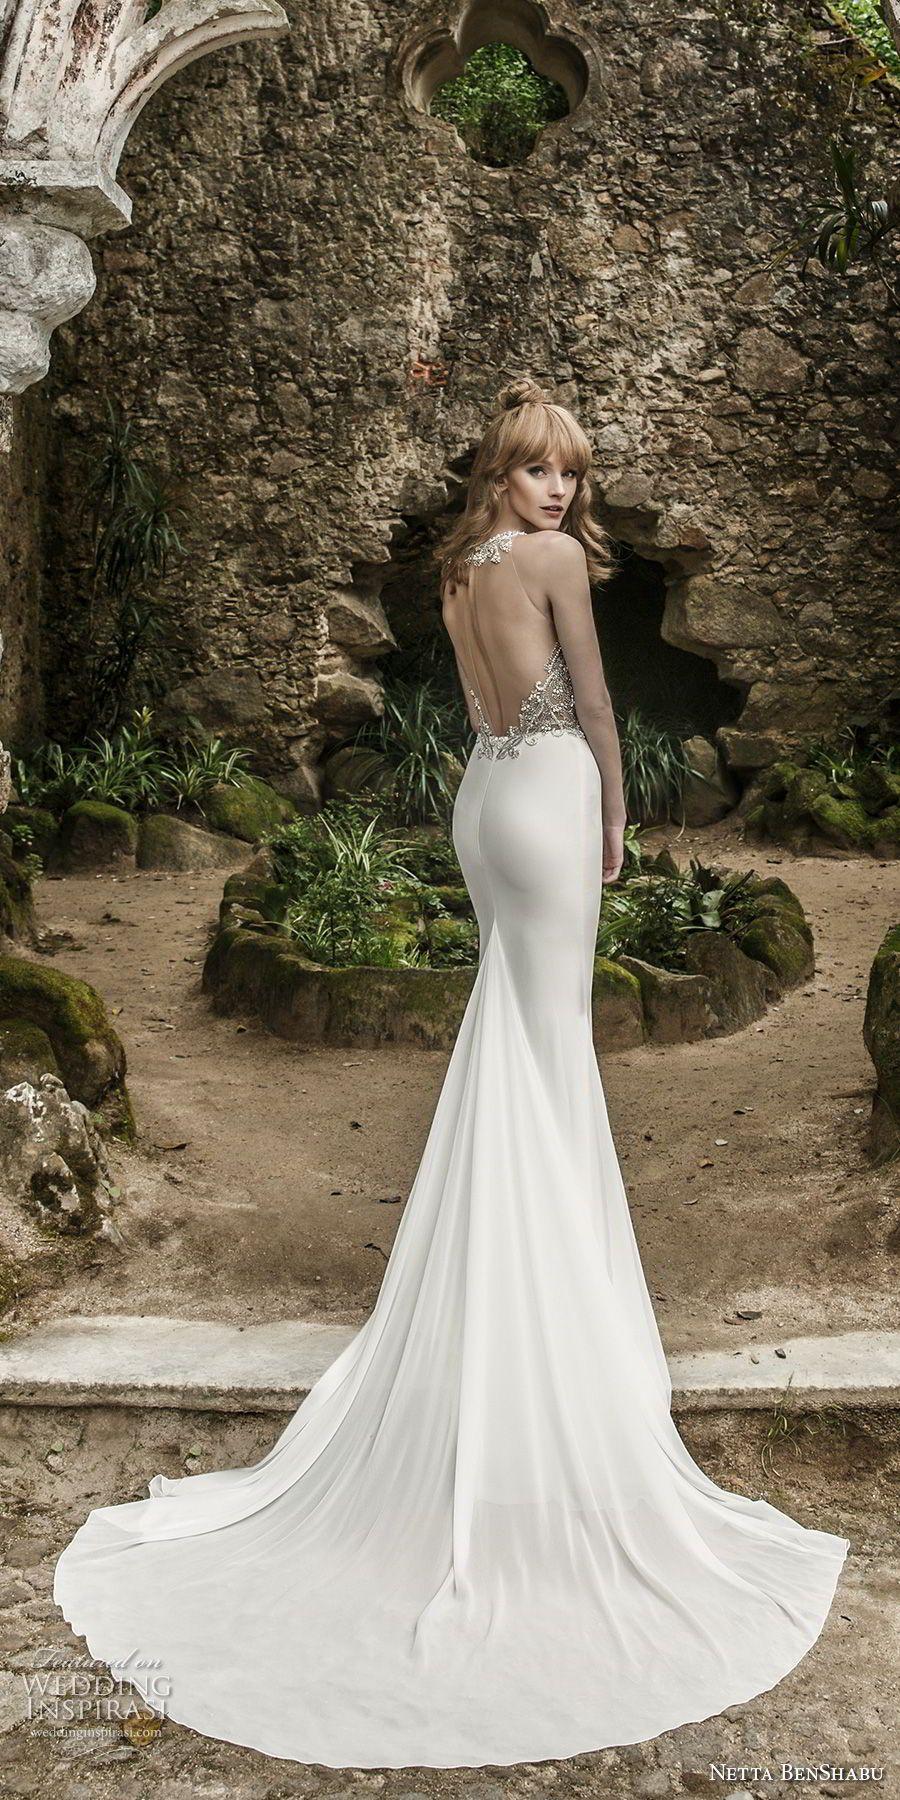 Netta benshabu wedding dresses u ucthe fairytale bride